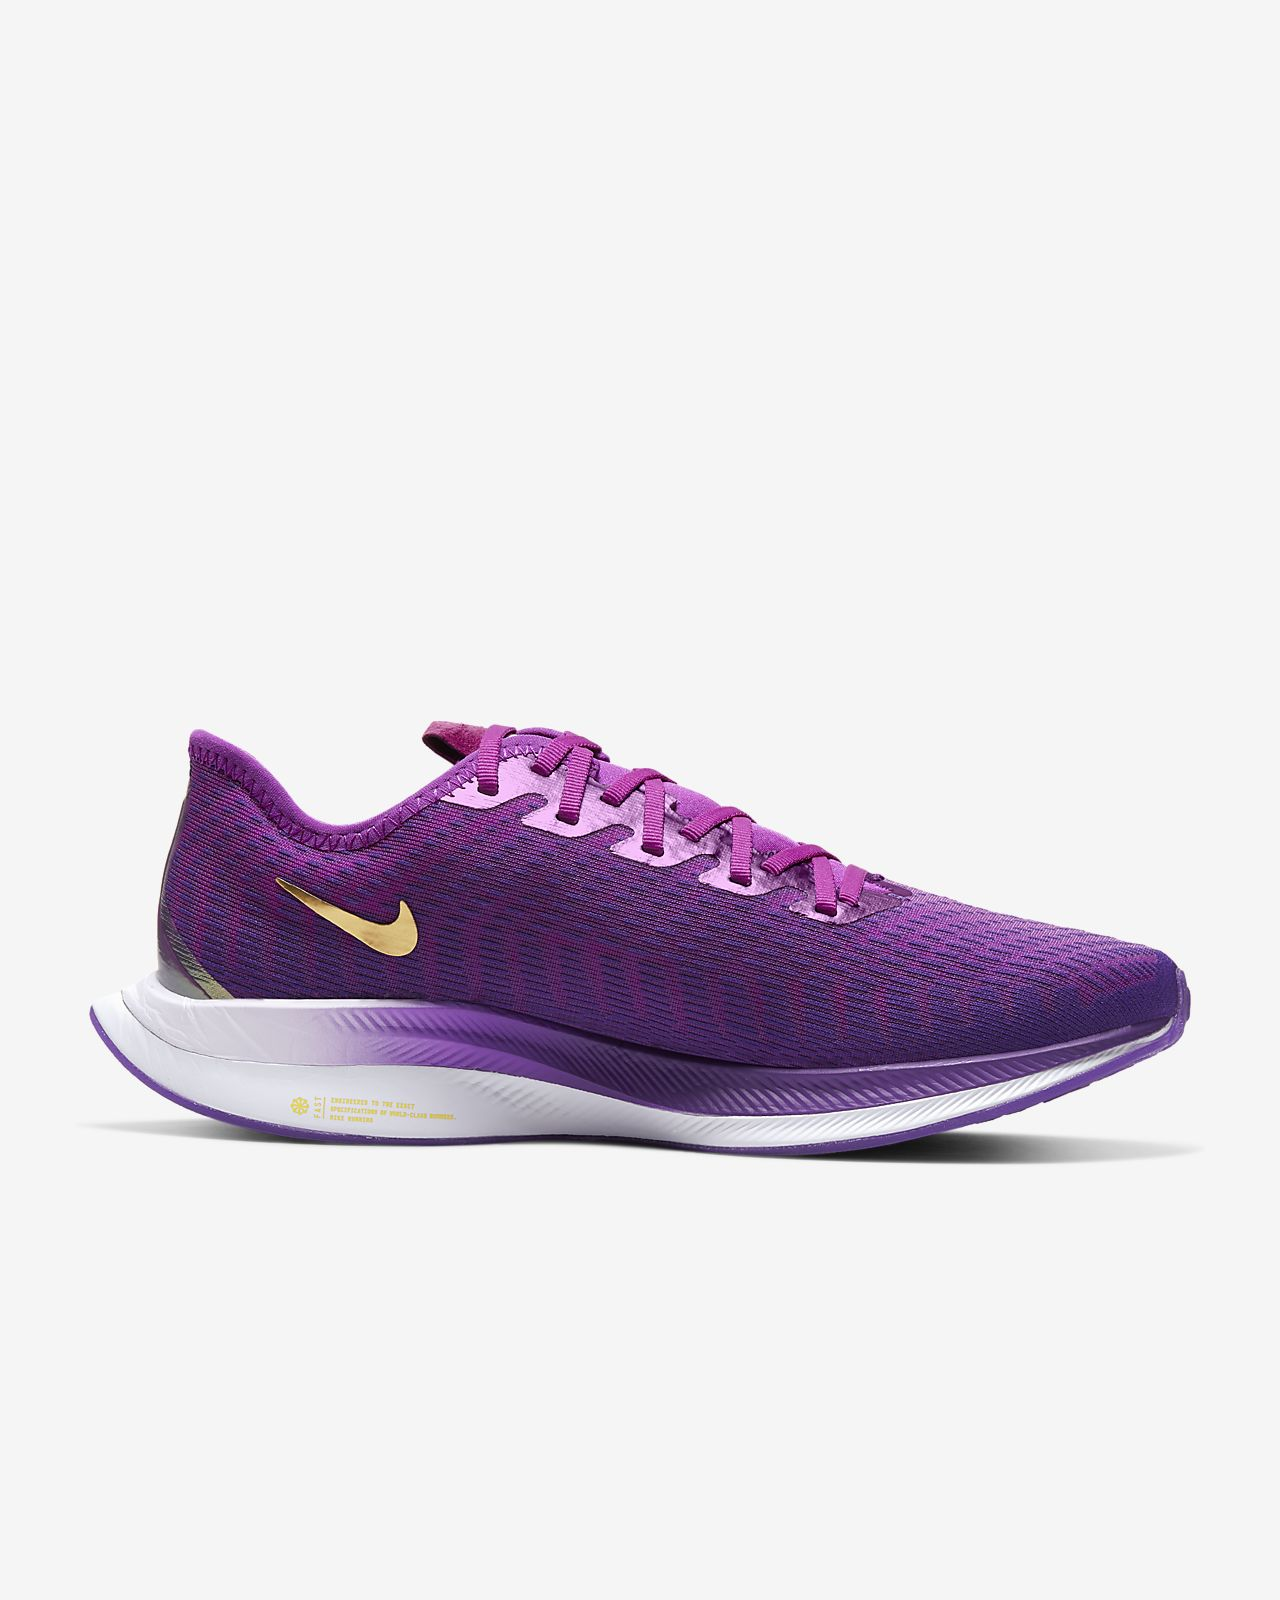 Calzado de running para mujer Nike Zoom Pegasus Turbo 2 Special Edition